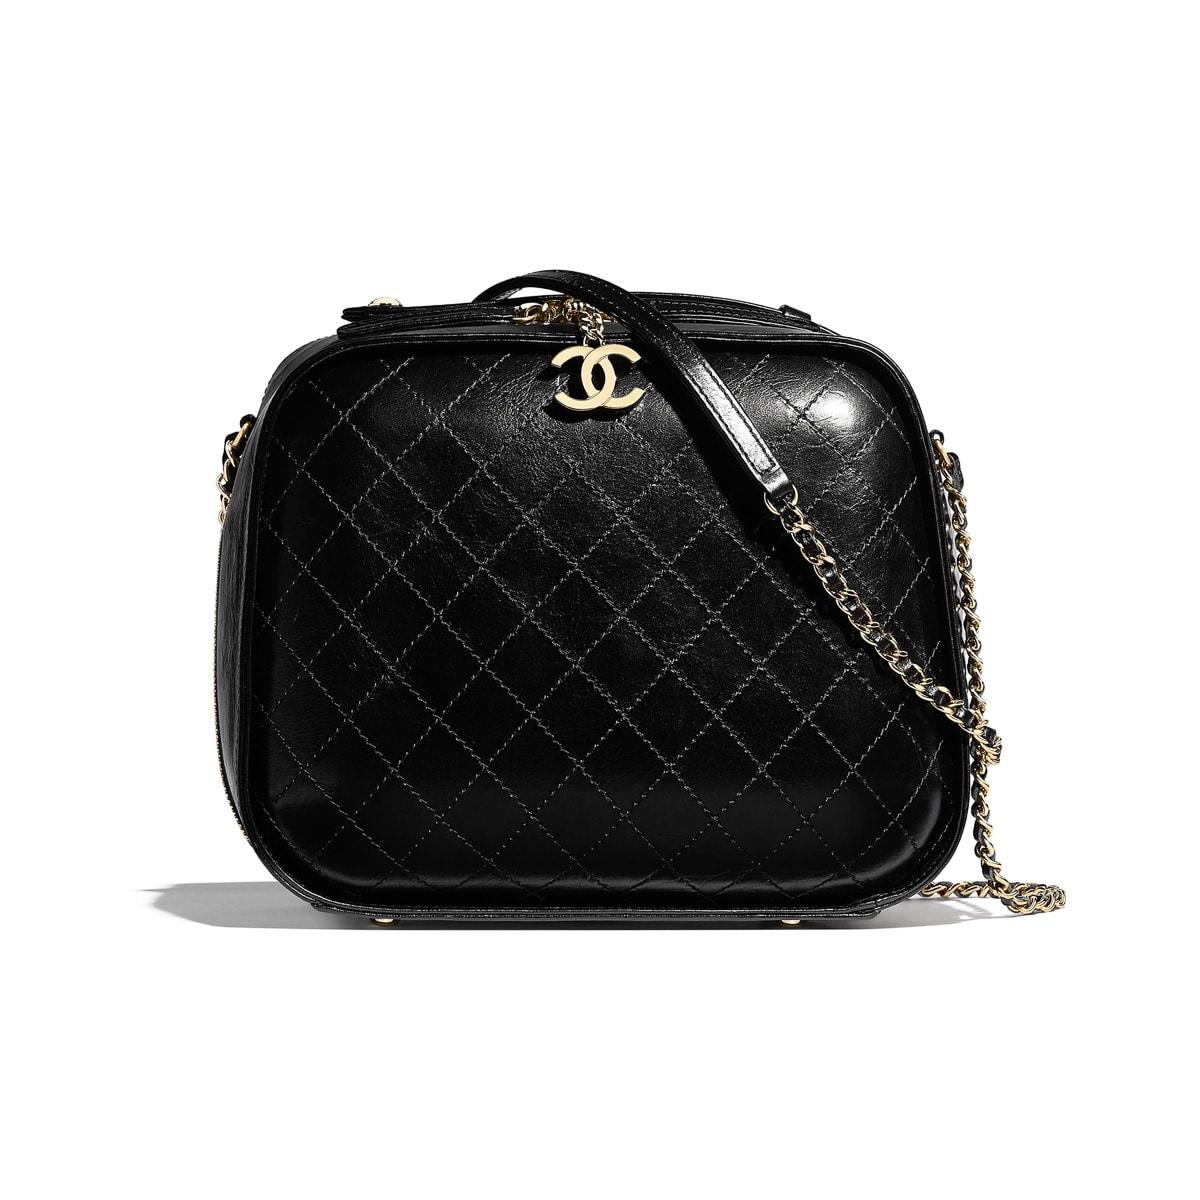 Chanel Bag Price Canada 2019 | SEMA Data Co-op